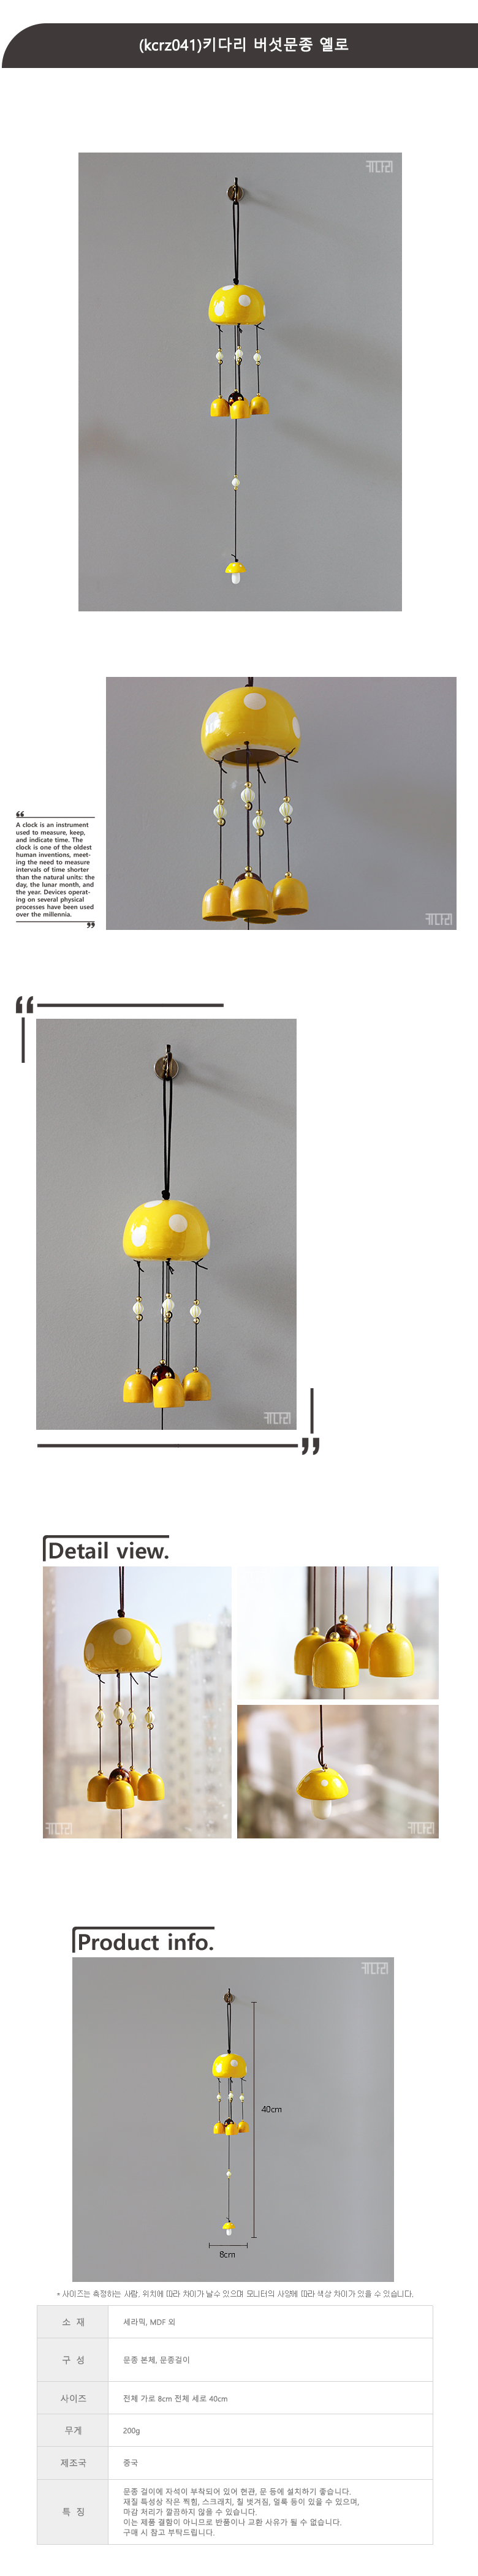 (kcrz041)키다리 버섯문종 옐로 - 키다리, 10,400원, 장식/부자재, 벽장식